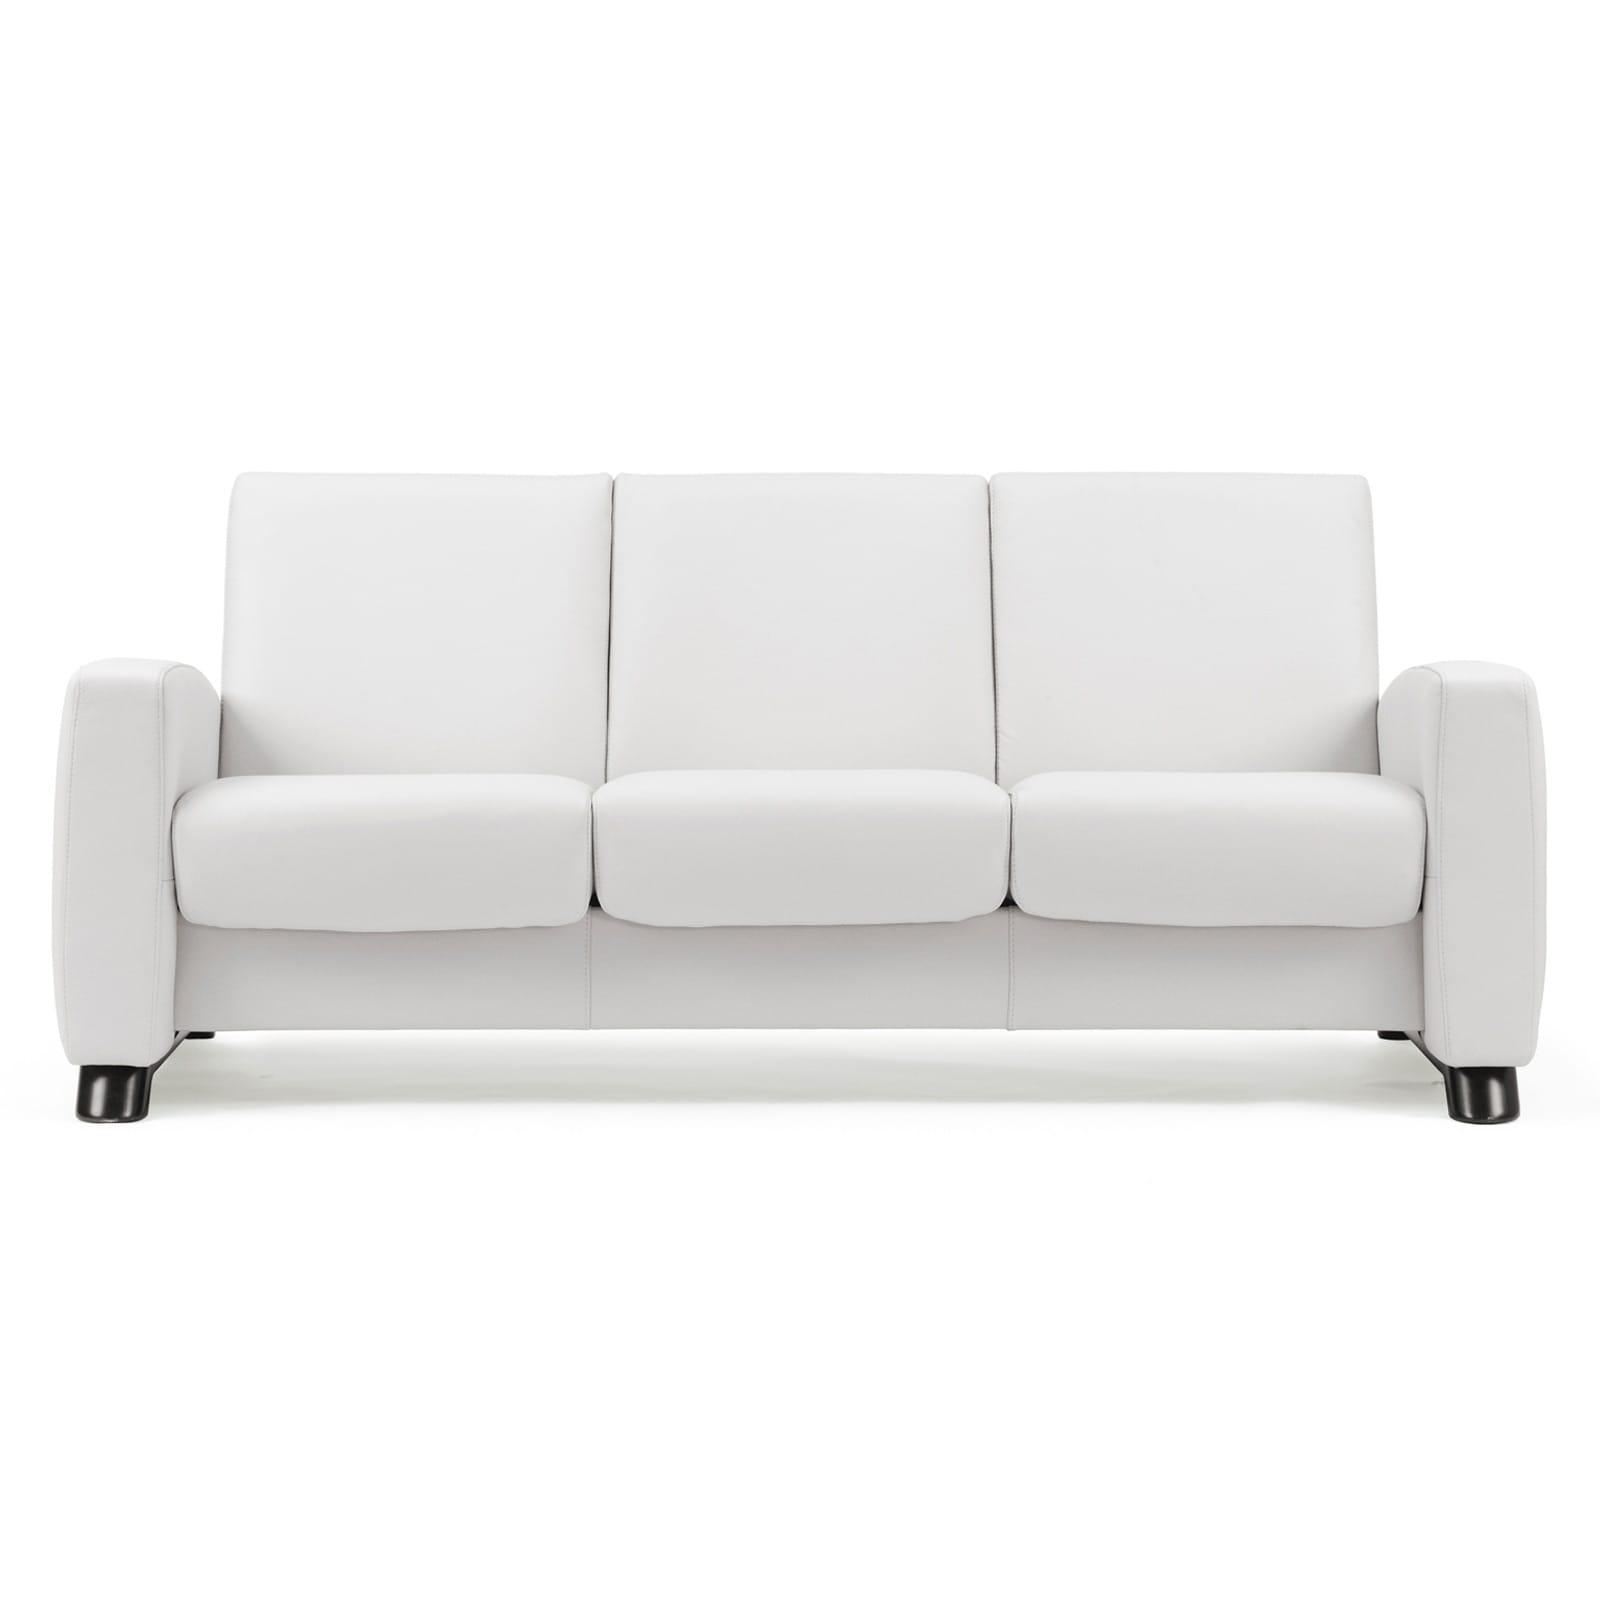 stressless sofa 3 sitzer arion m niedrig snow schwarz. Black Bedroom Furniture Sets. Home Design Ideas